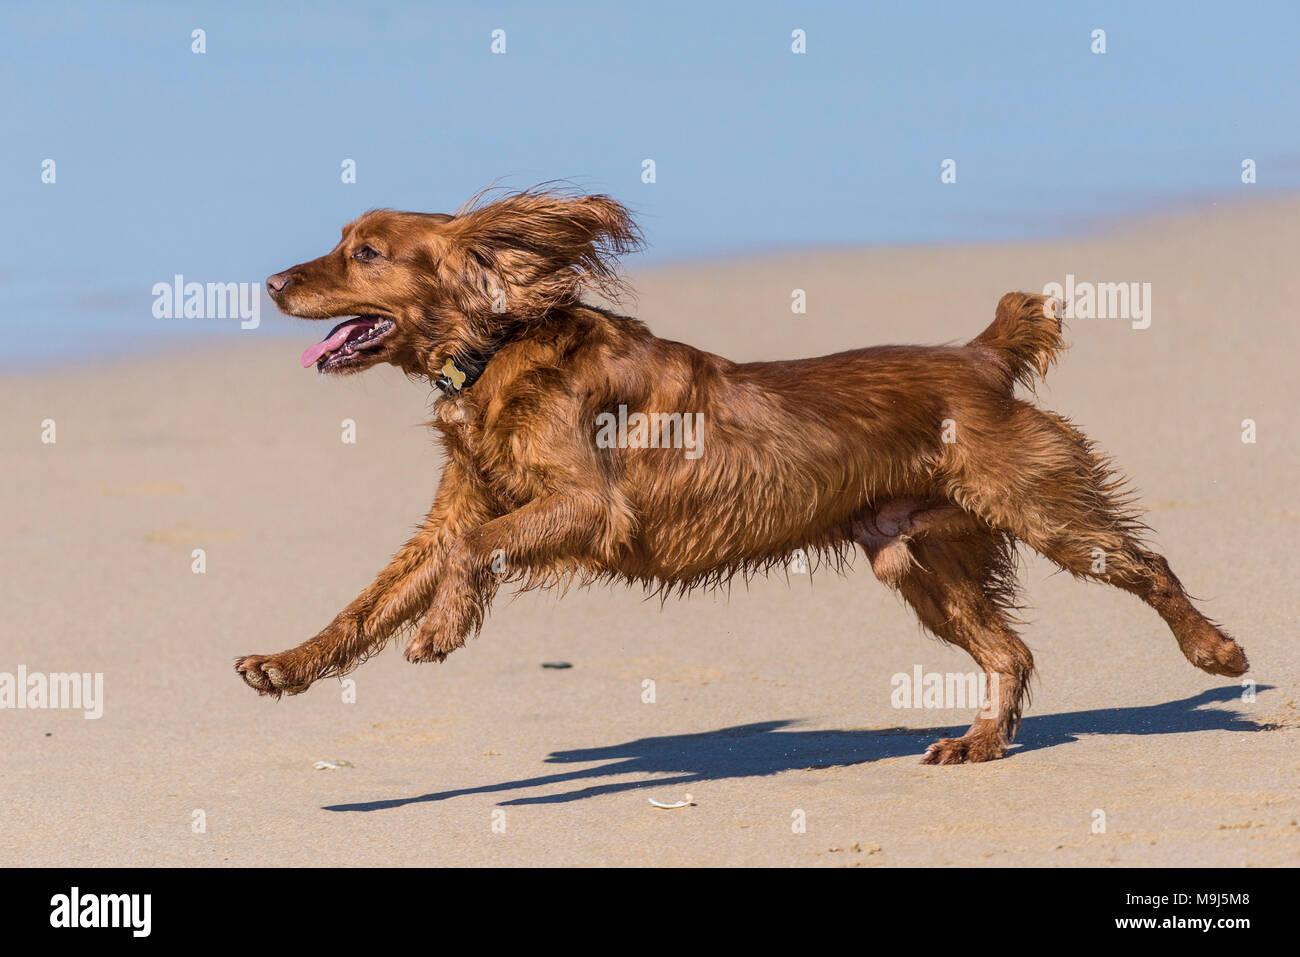 A Cocker Spaniel dog running across a beach in Cornwall. - Stock Image